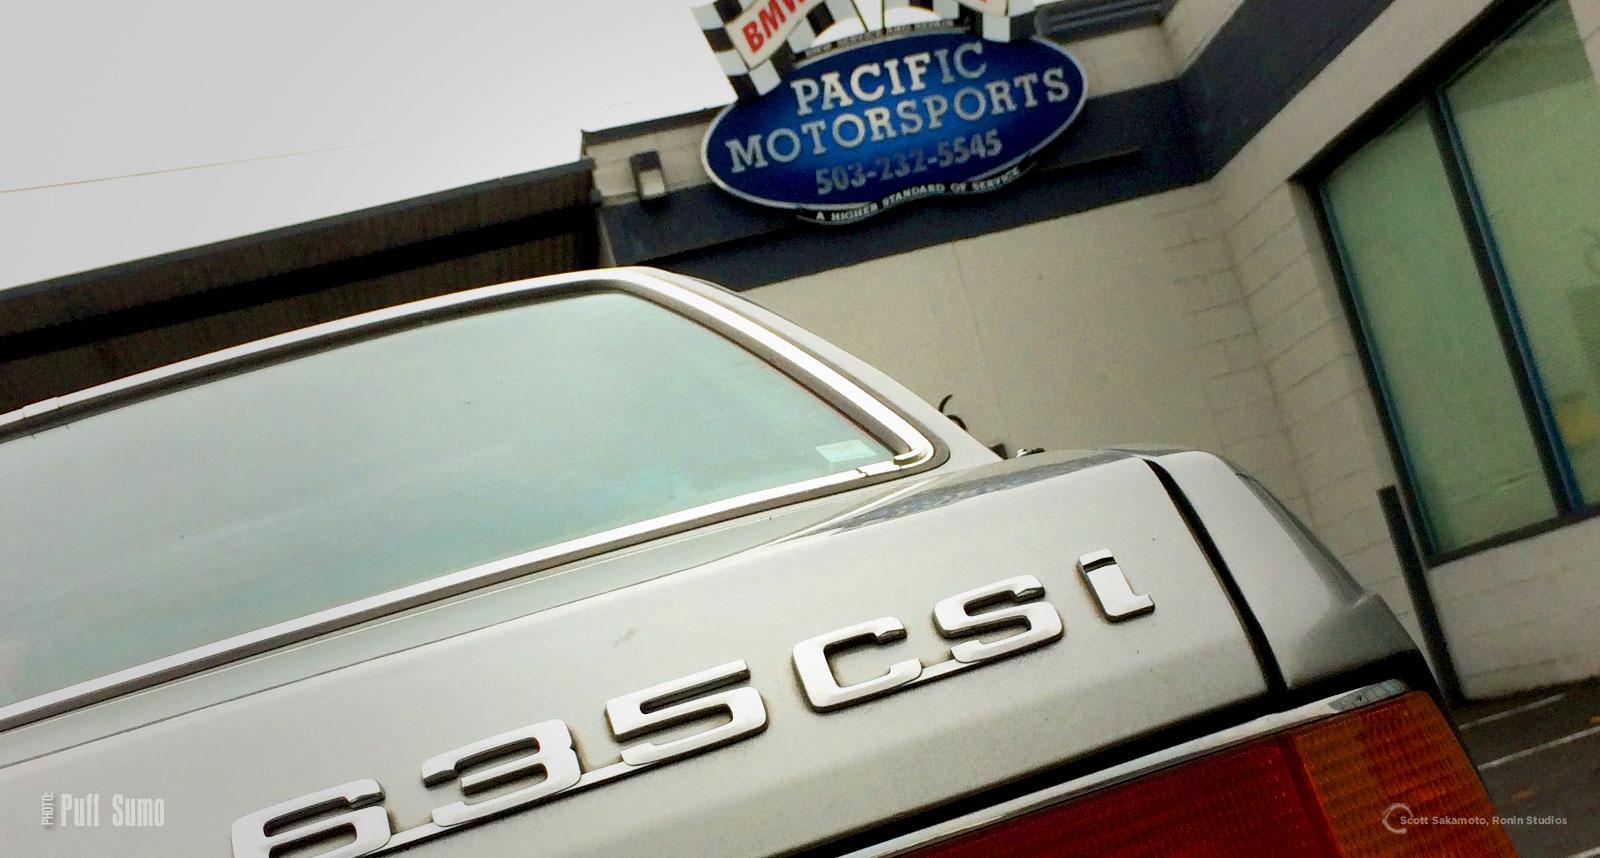 Pacific Motorsports, BMW Repair, BMW Service, Mark Dikeos,